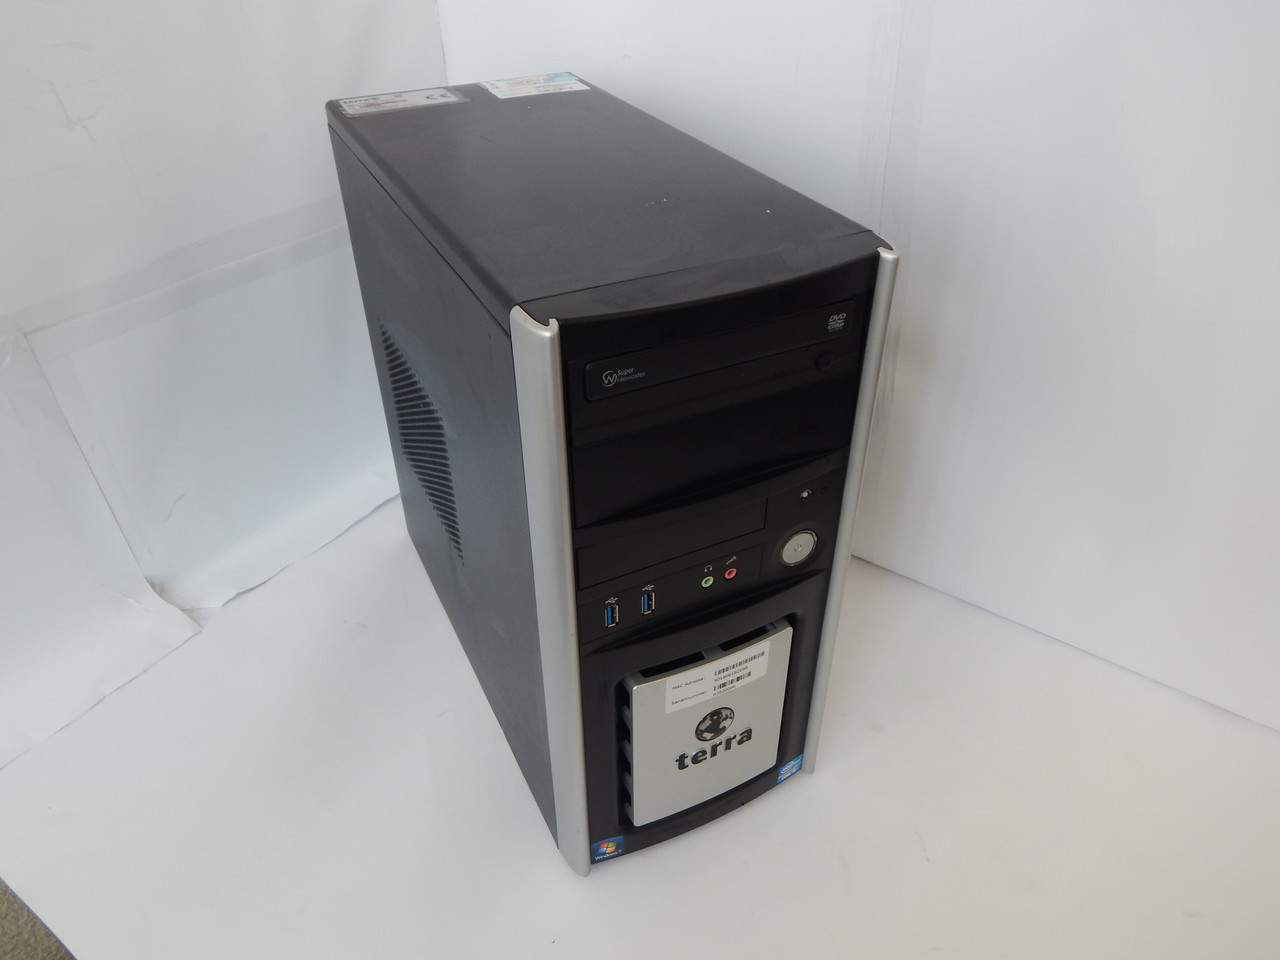 Системний блок Terra 6100 i5-3470 RAM 4 ГБ HDD 250 Гб  usb 3.0 socket 1155